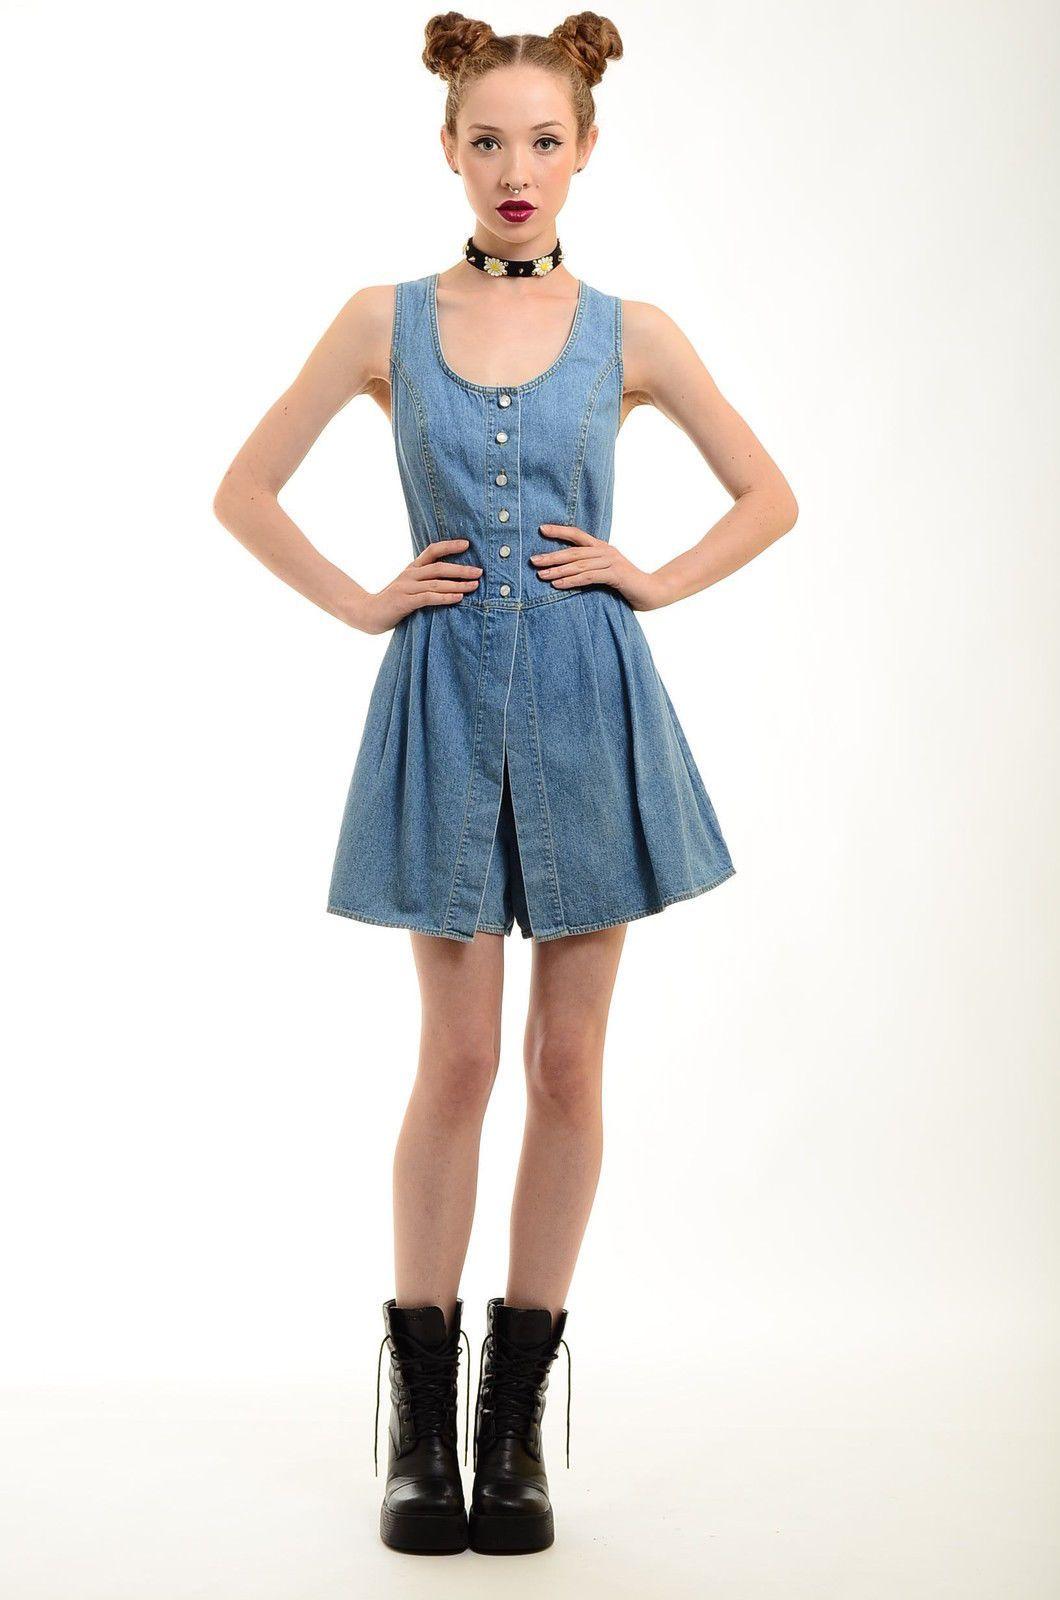 60fc760d9d Vtg 80s 90s Faded Denim Grunge Jean Shorts Romper Mini Dress Overalls Jumper  M